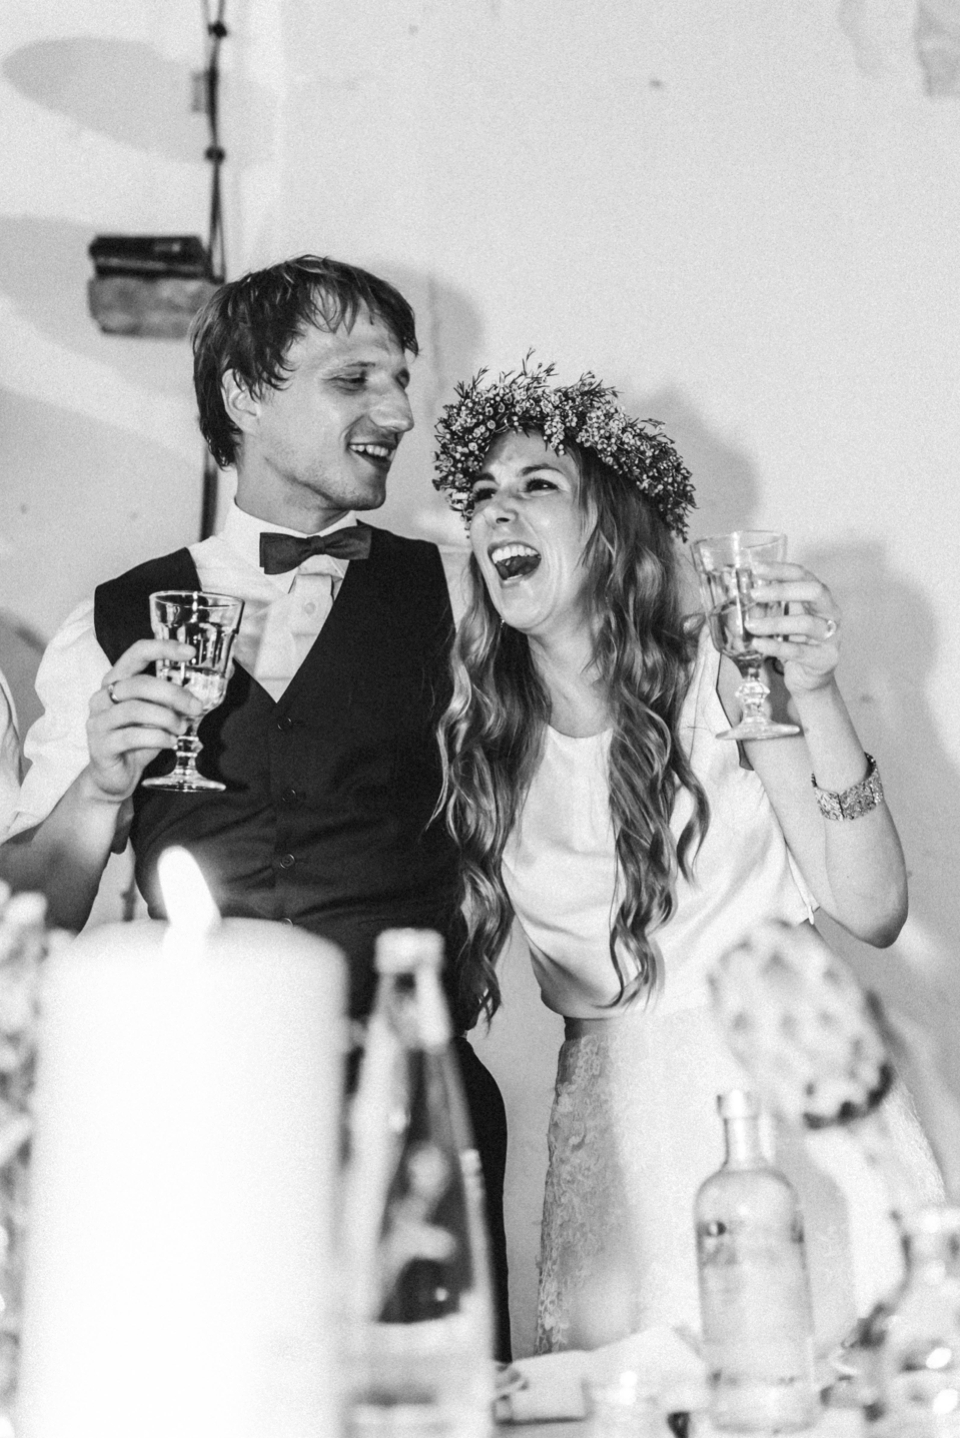 rembostyling-weddinginspiration-kreativ-wedding-wedding-belin-loft23_0396